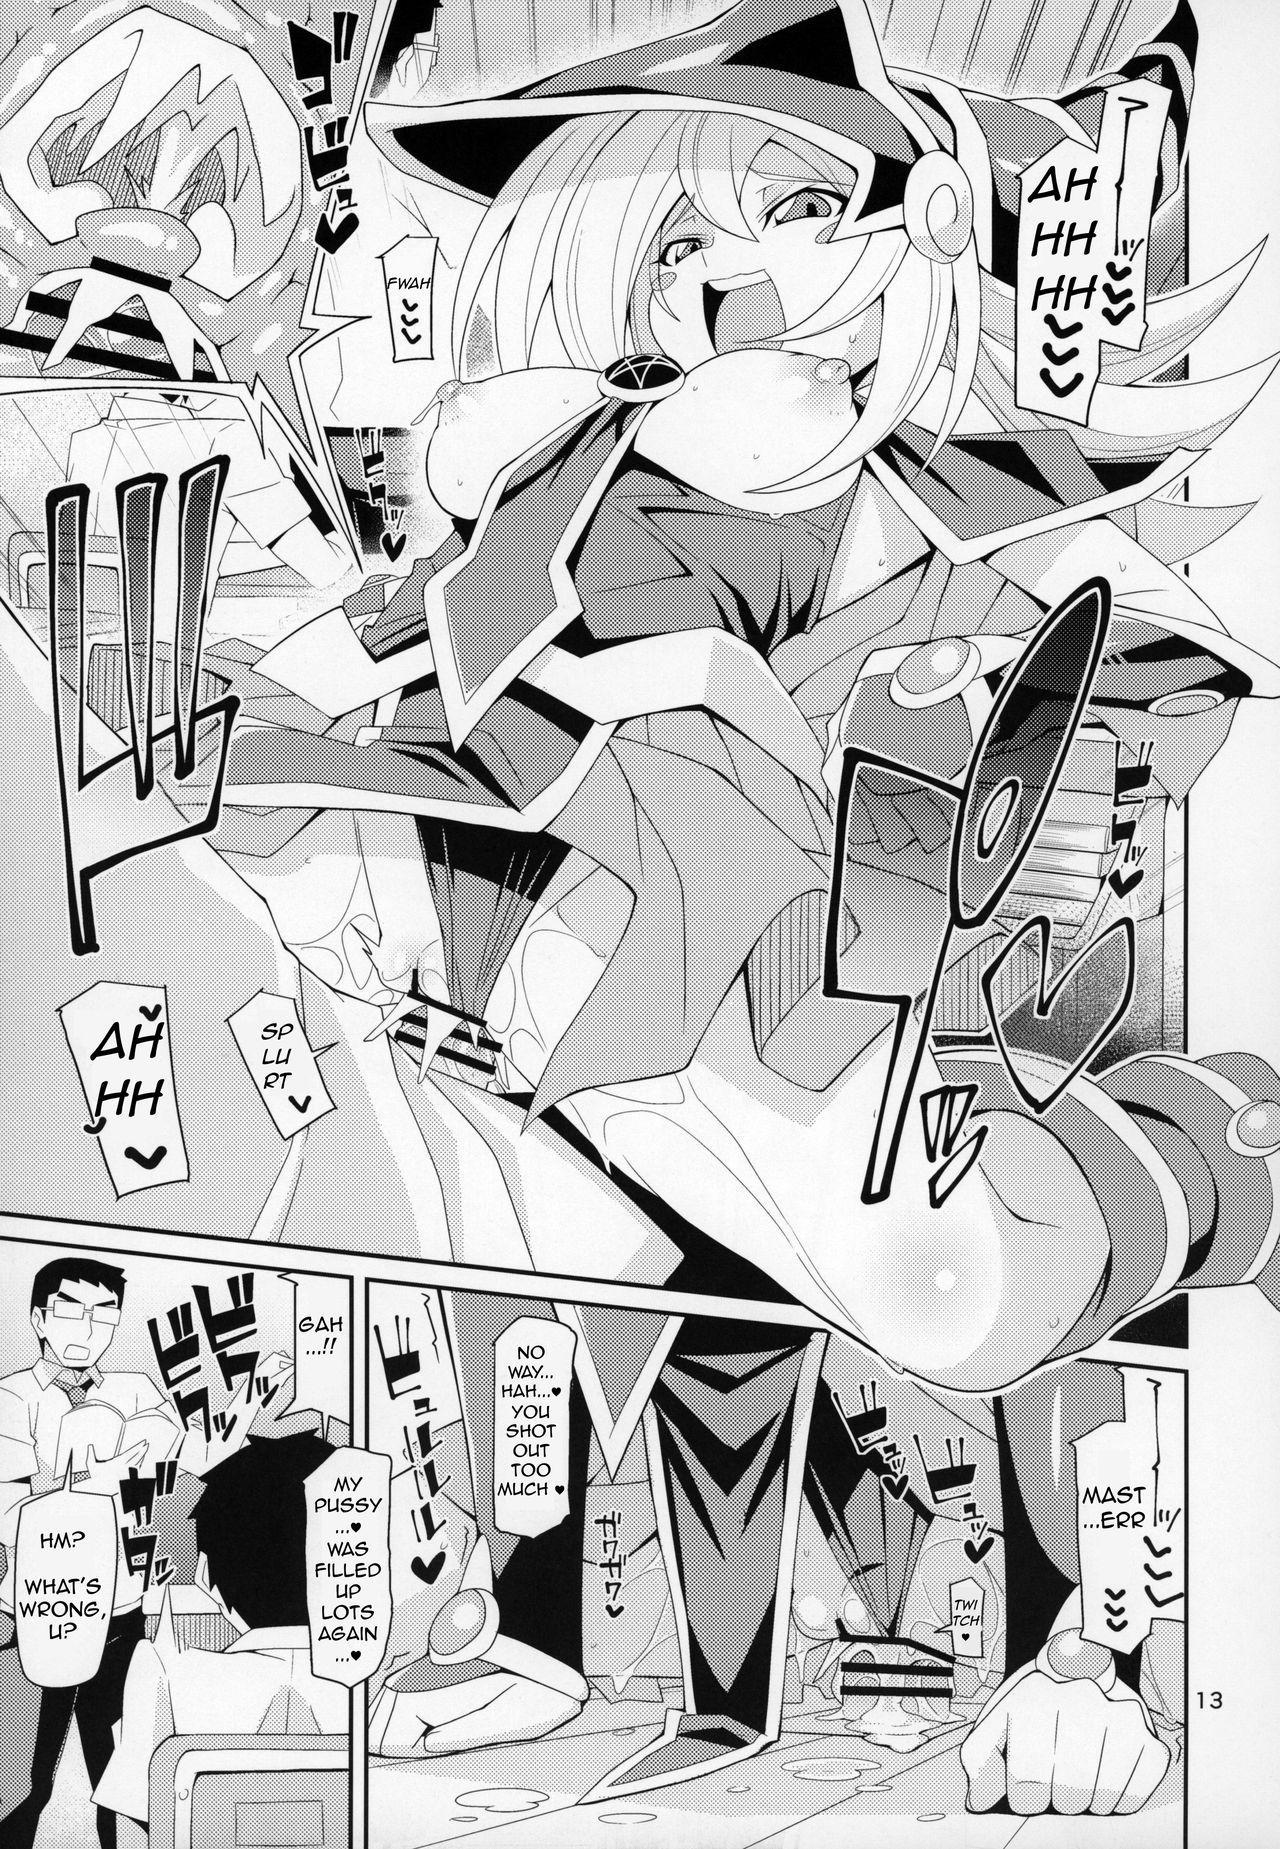 [4or5 Works (Chicago)] BMG -Shimobe- ga Iru Seikatsu | Sex Life with -Servant- BMG (Yu-Gi-Oh!) [English] [AdmiralMoe] 11